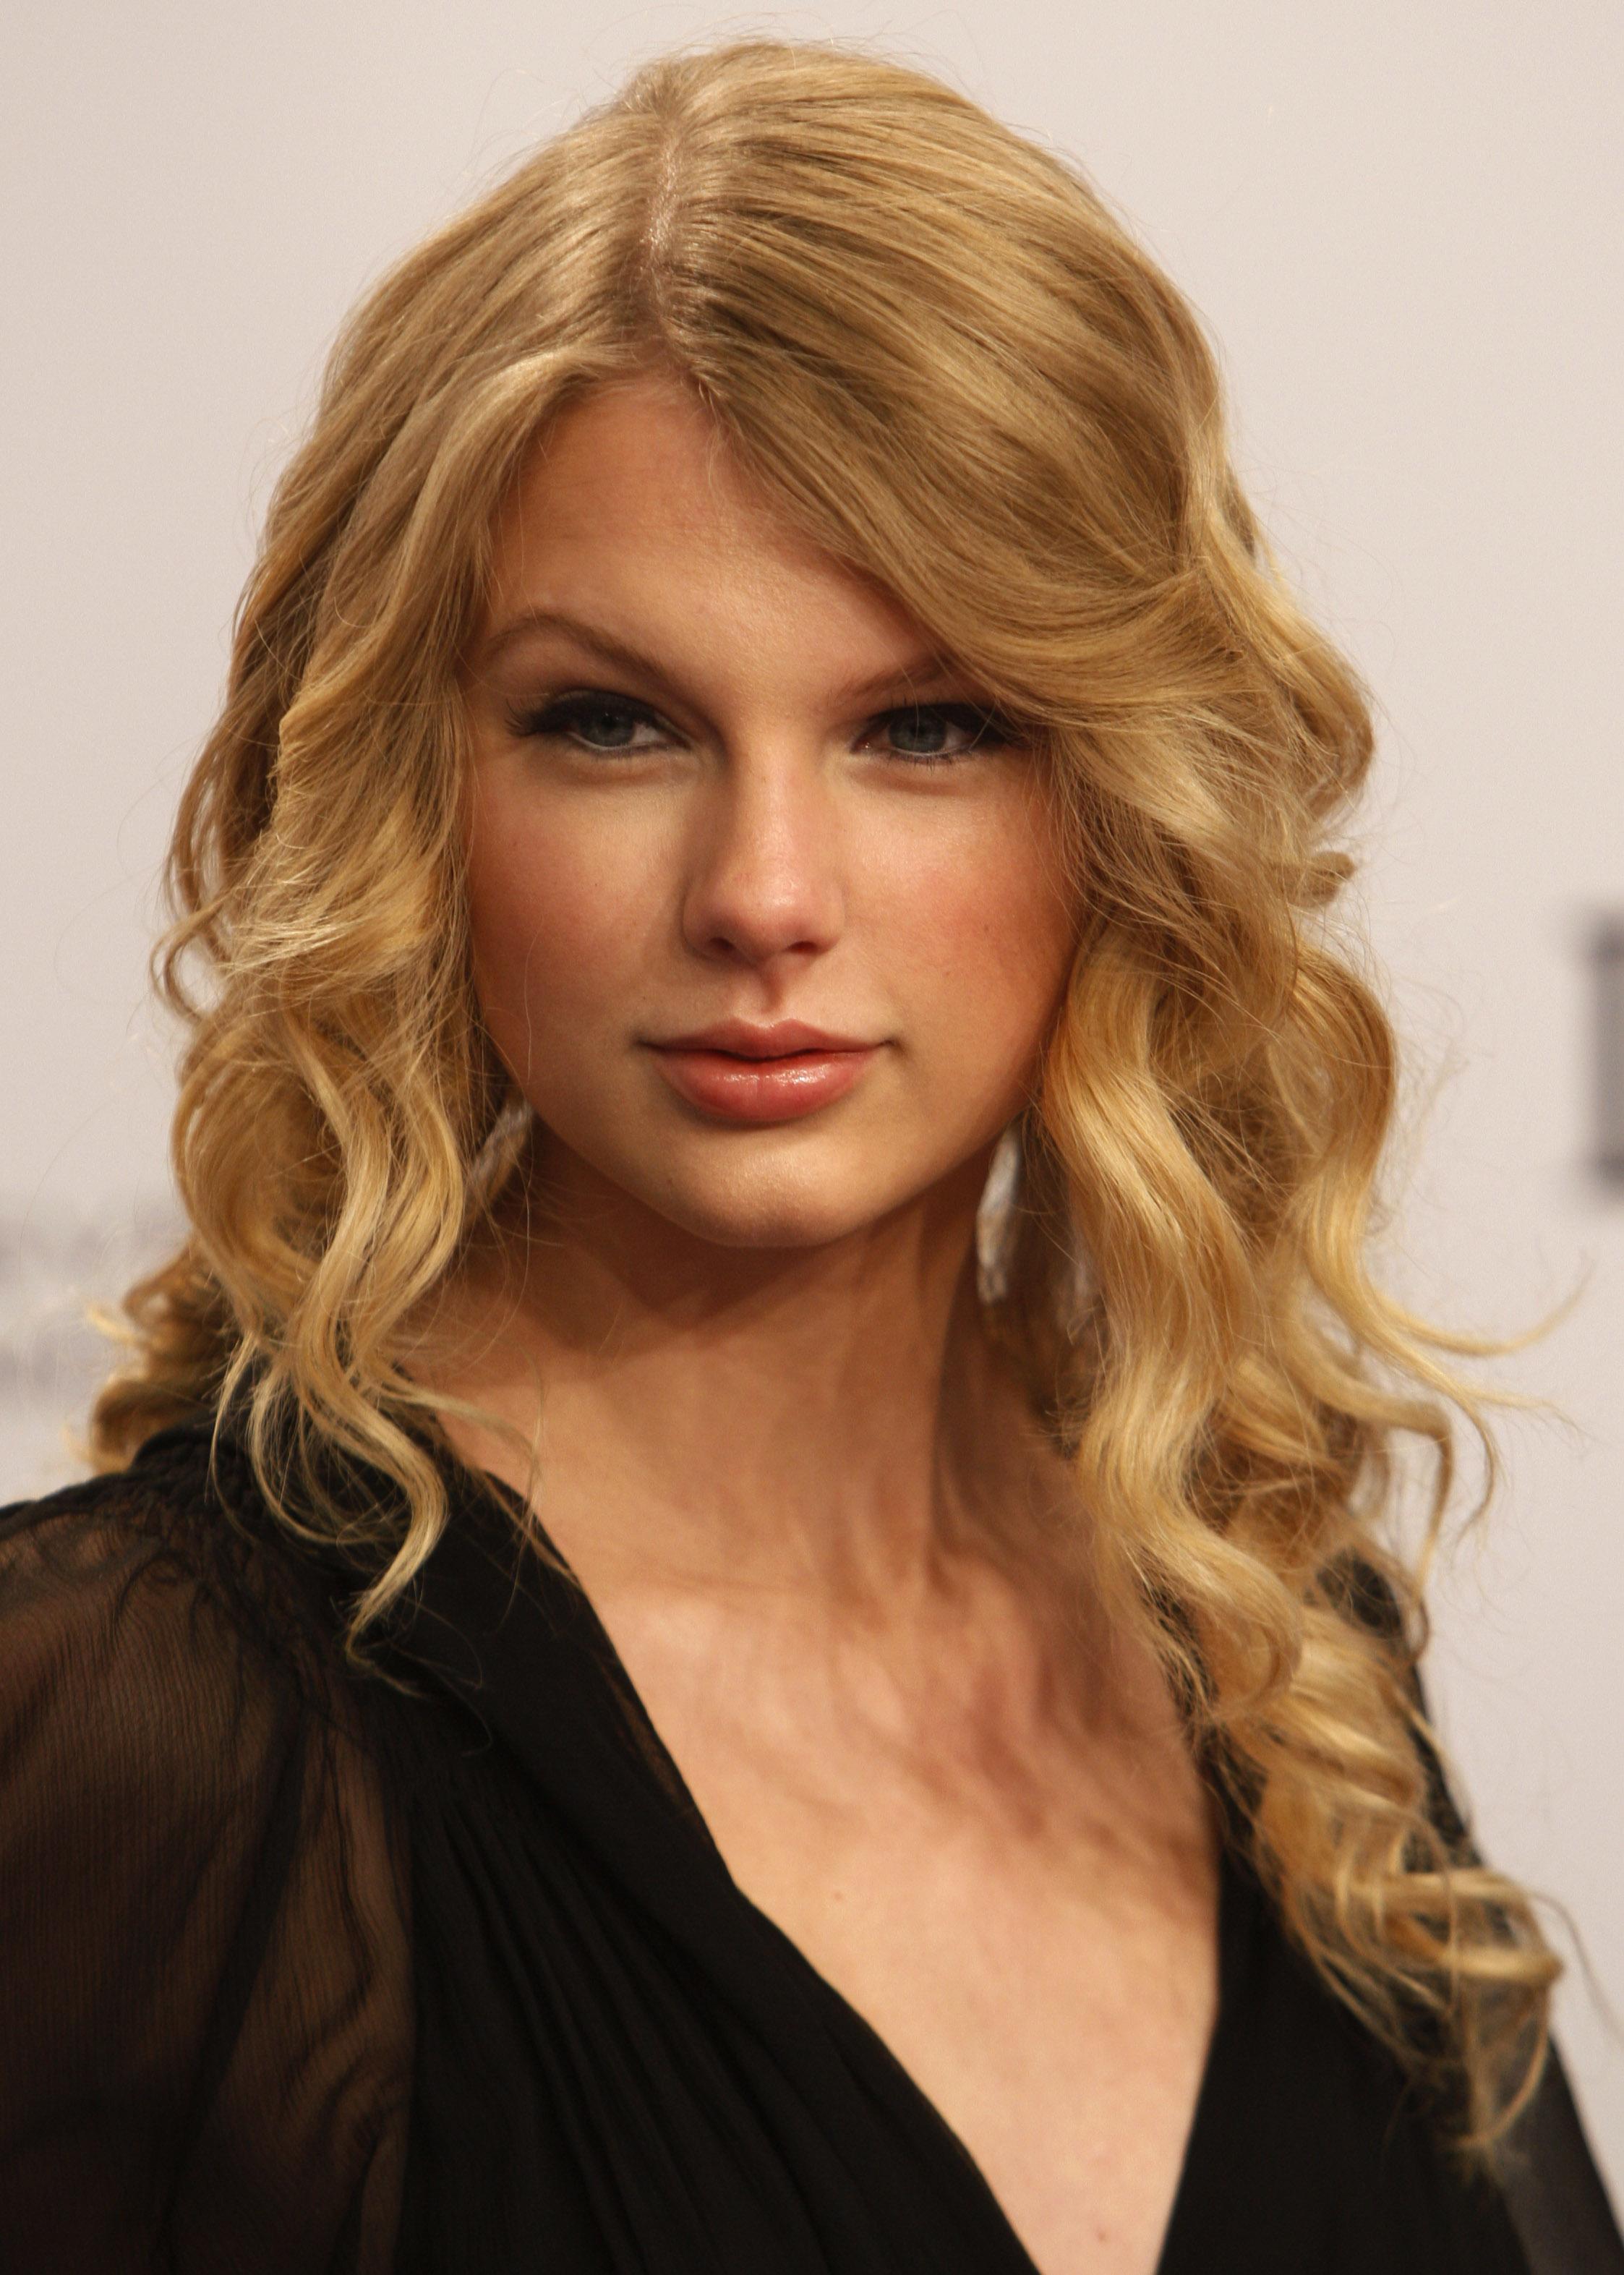 Swift?